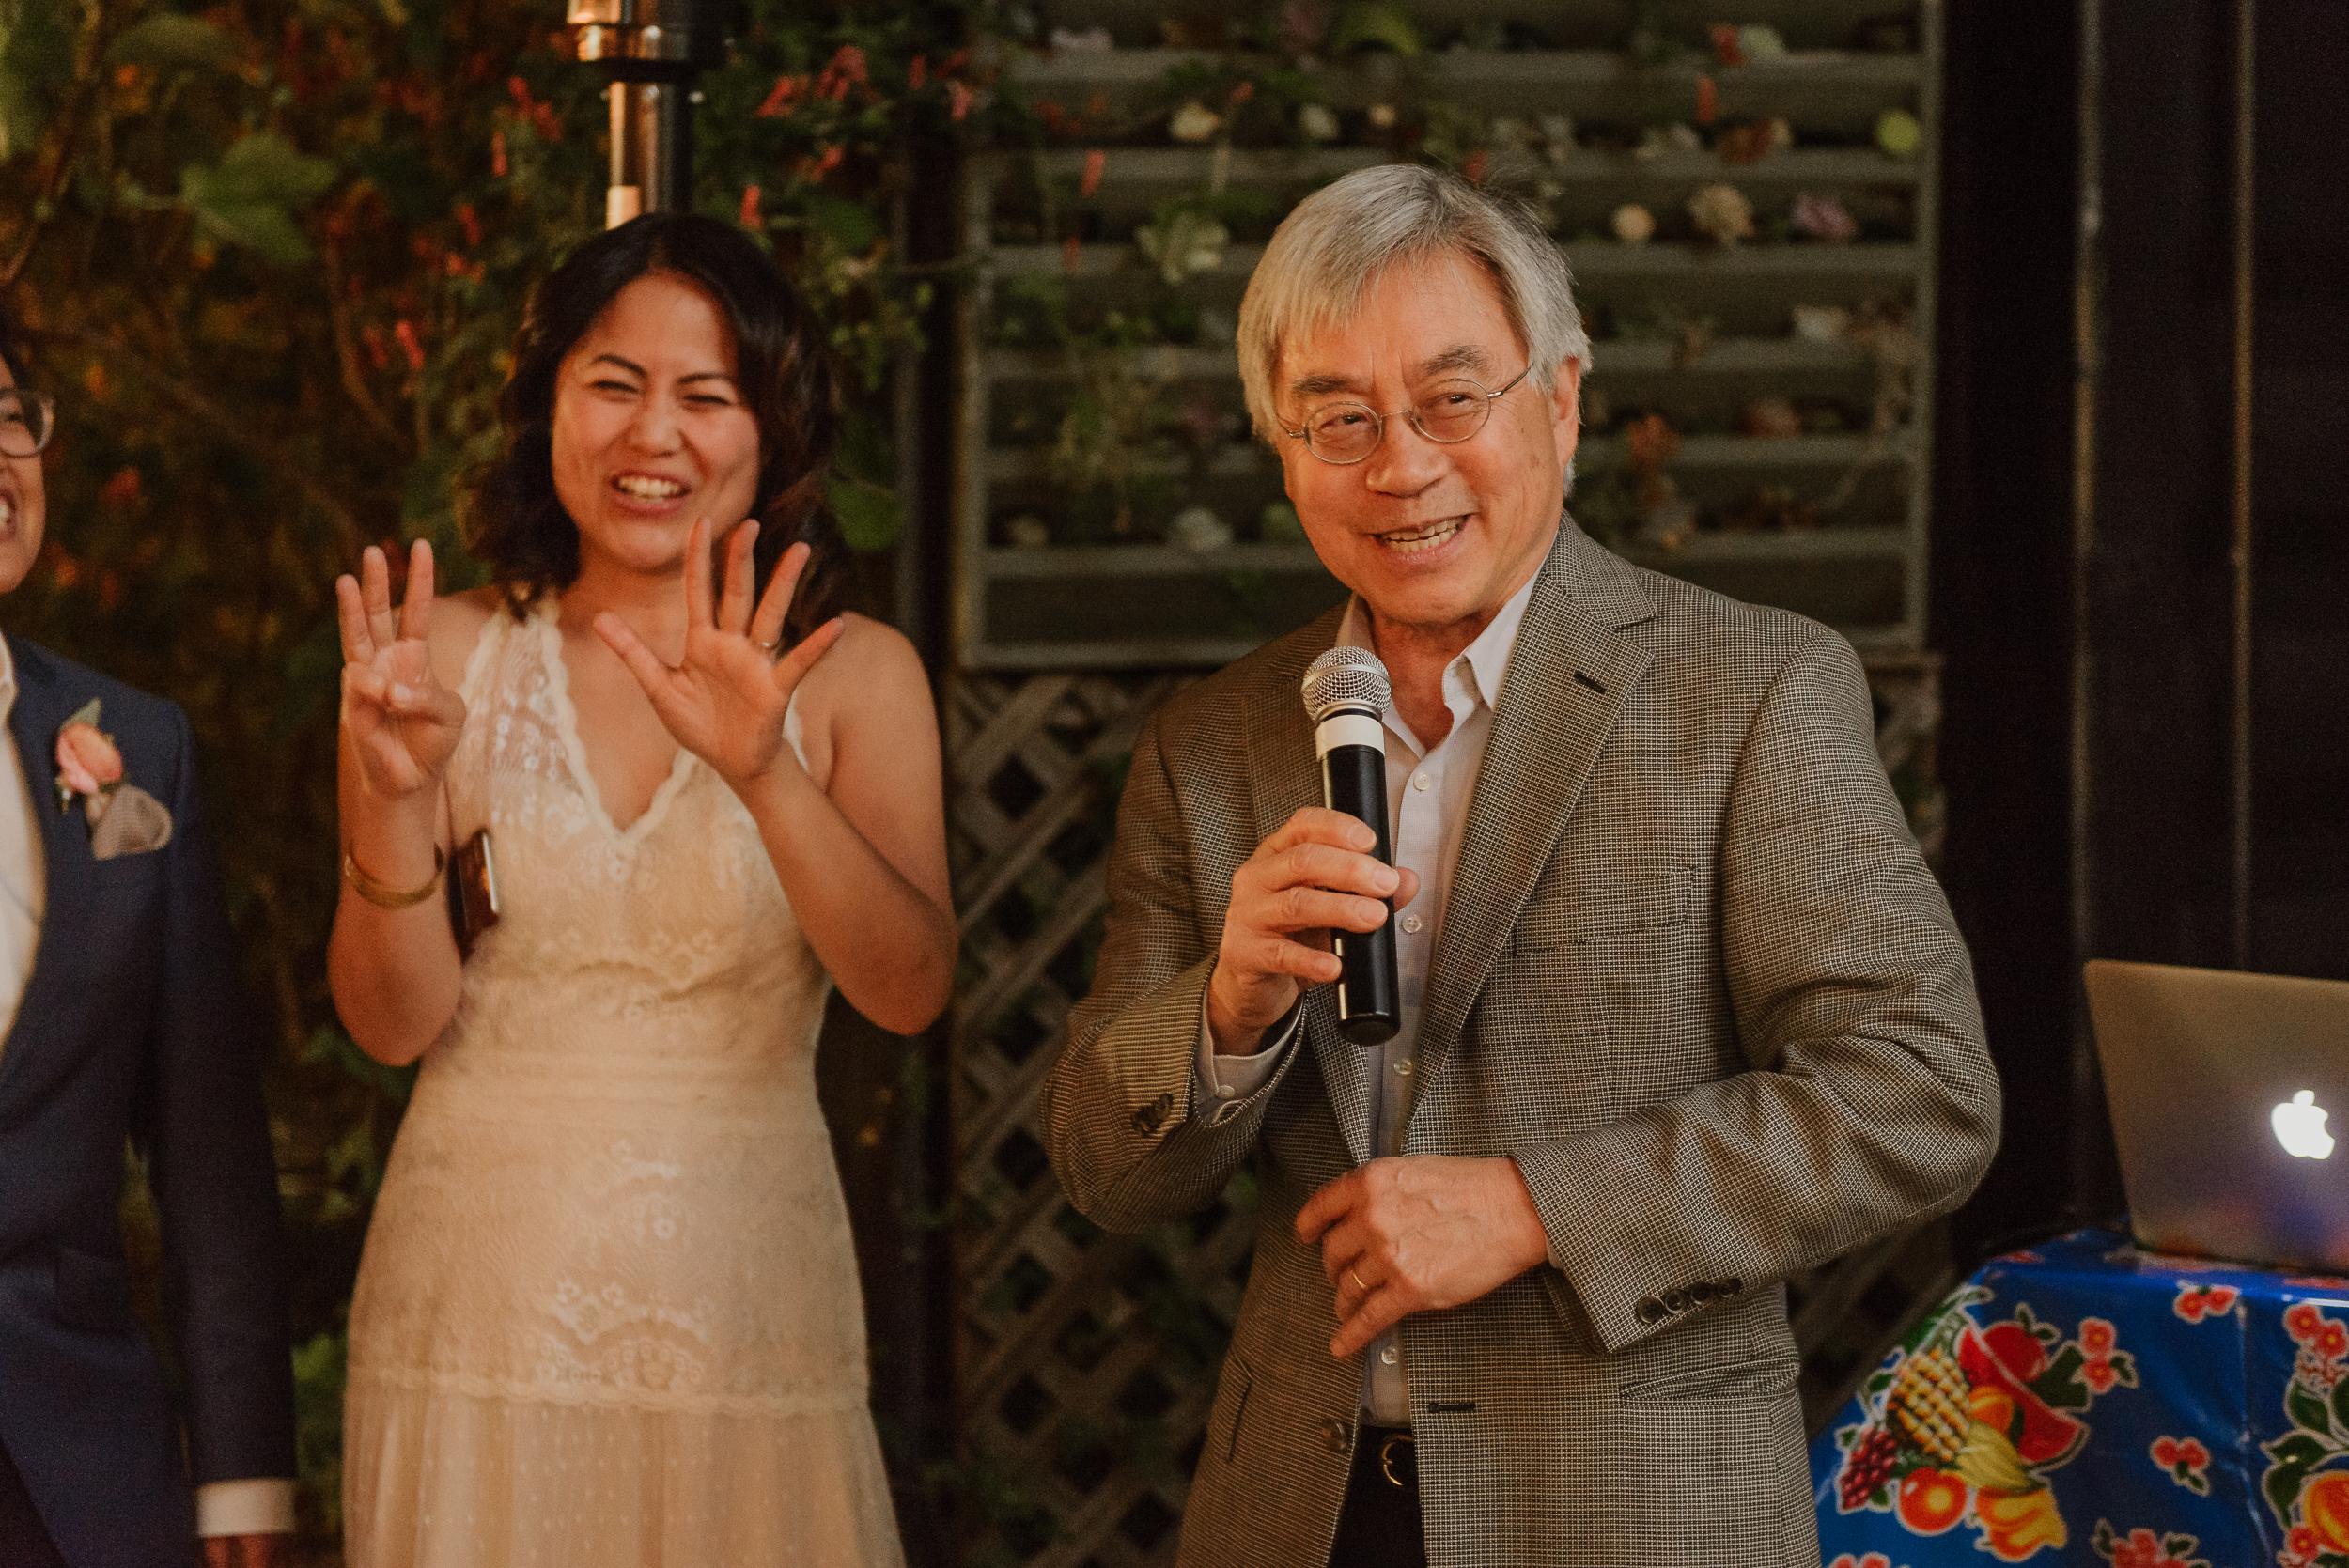 088-88-san-francisco-city-hall-stable-cafe-wedding-vivianchen-555.jpg